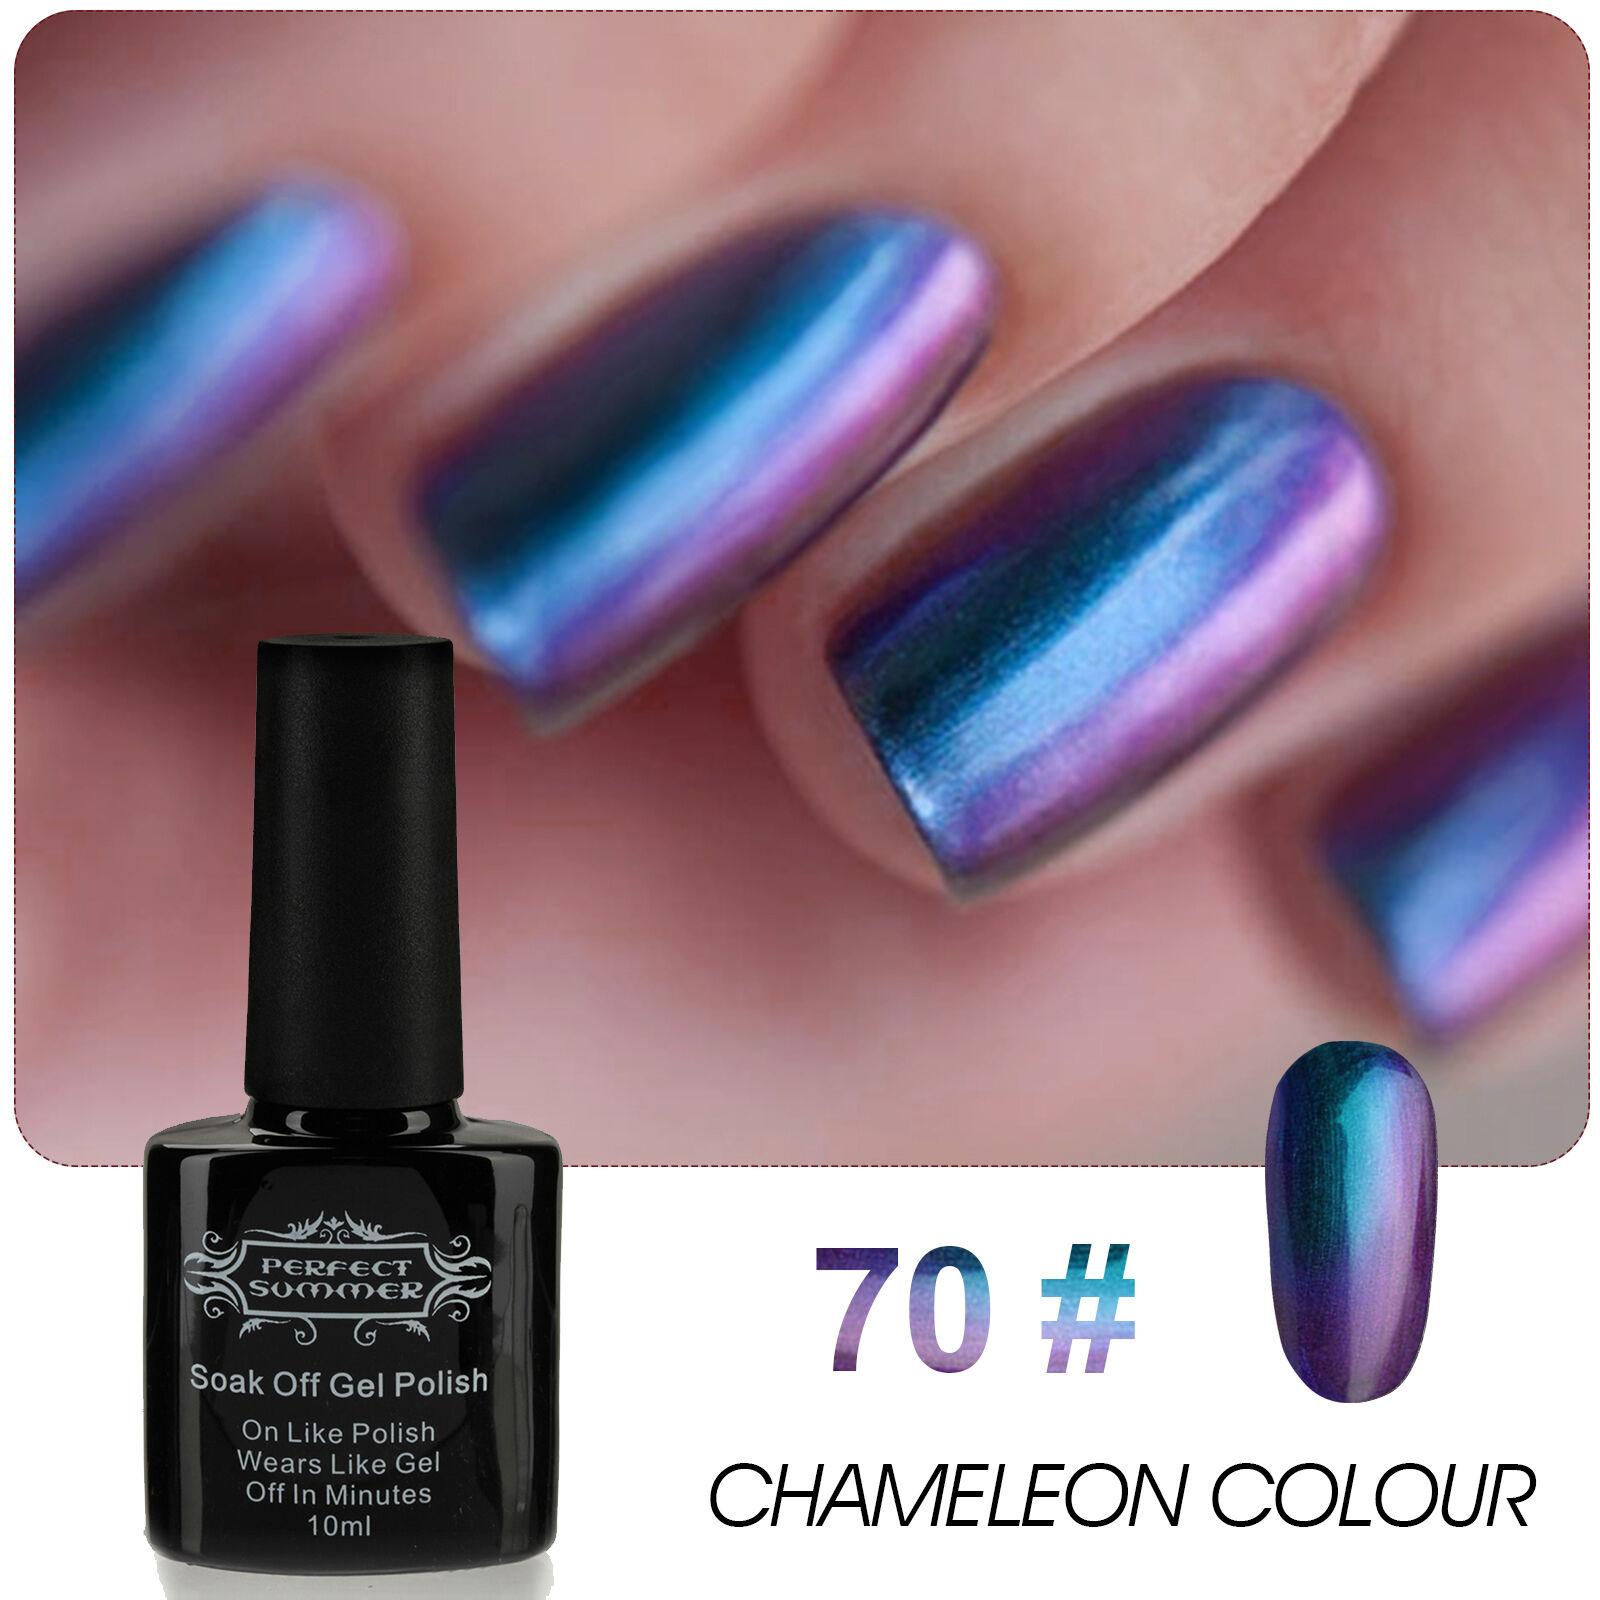 Nail art color violet - Chameleon Color Change Uv Gel Polish Nail Art Metallic Color Long Last 10ml 70